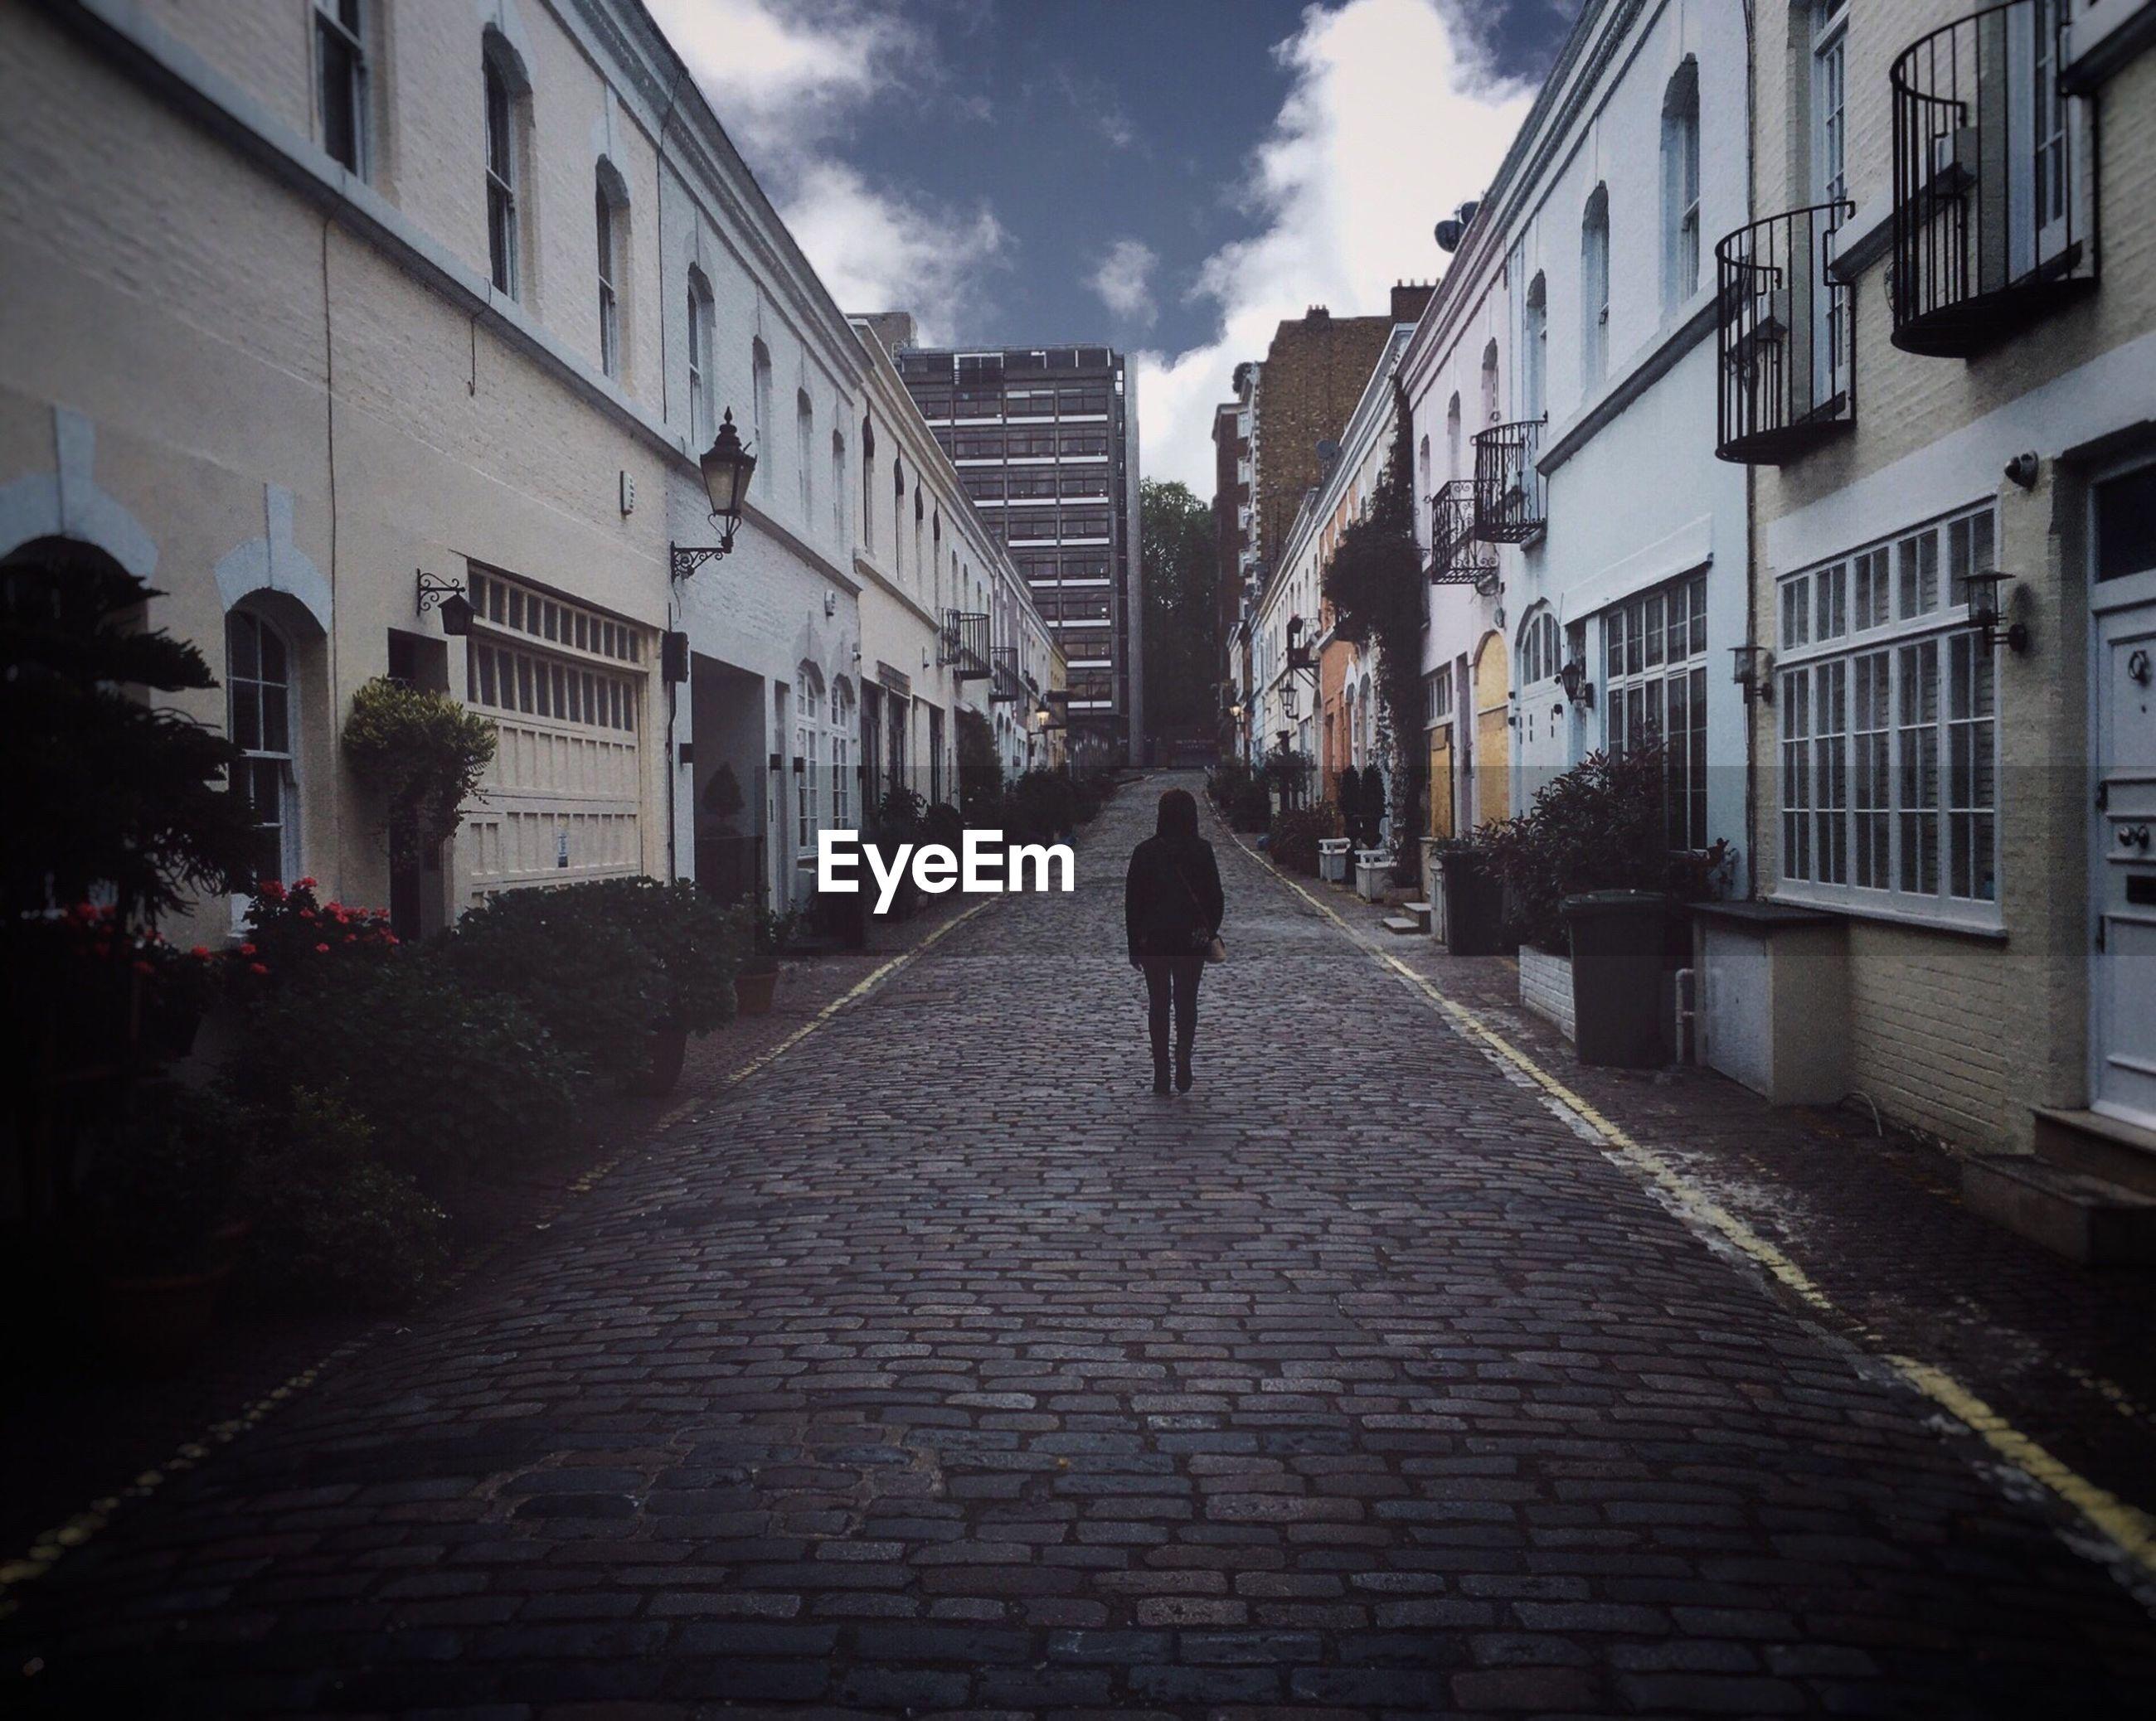 Man walking on alley amidst street